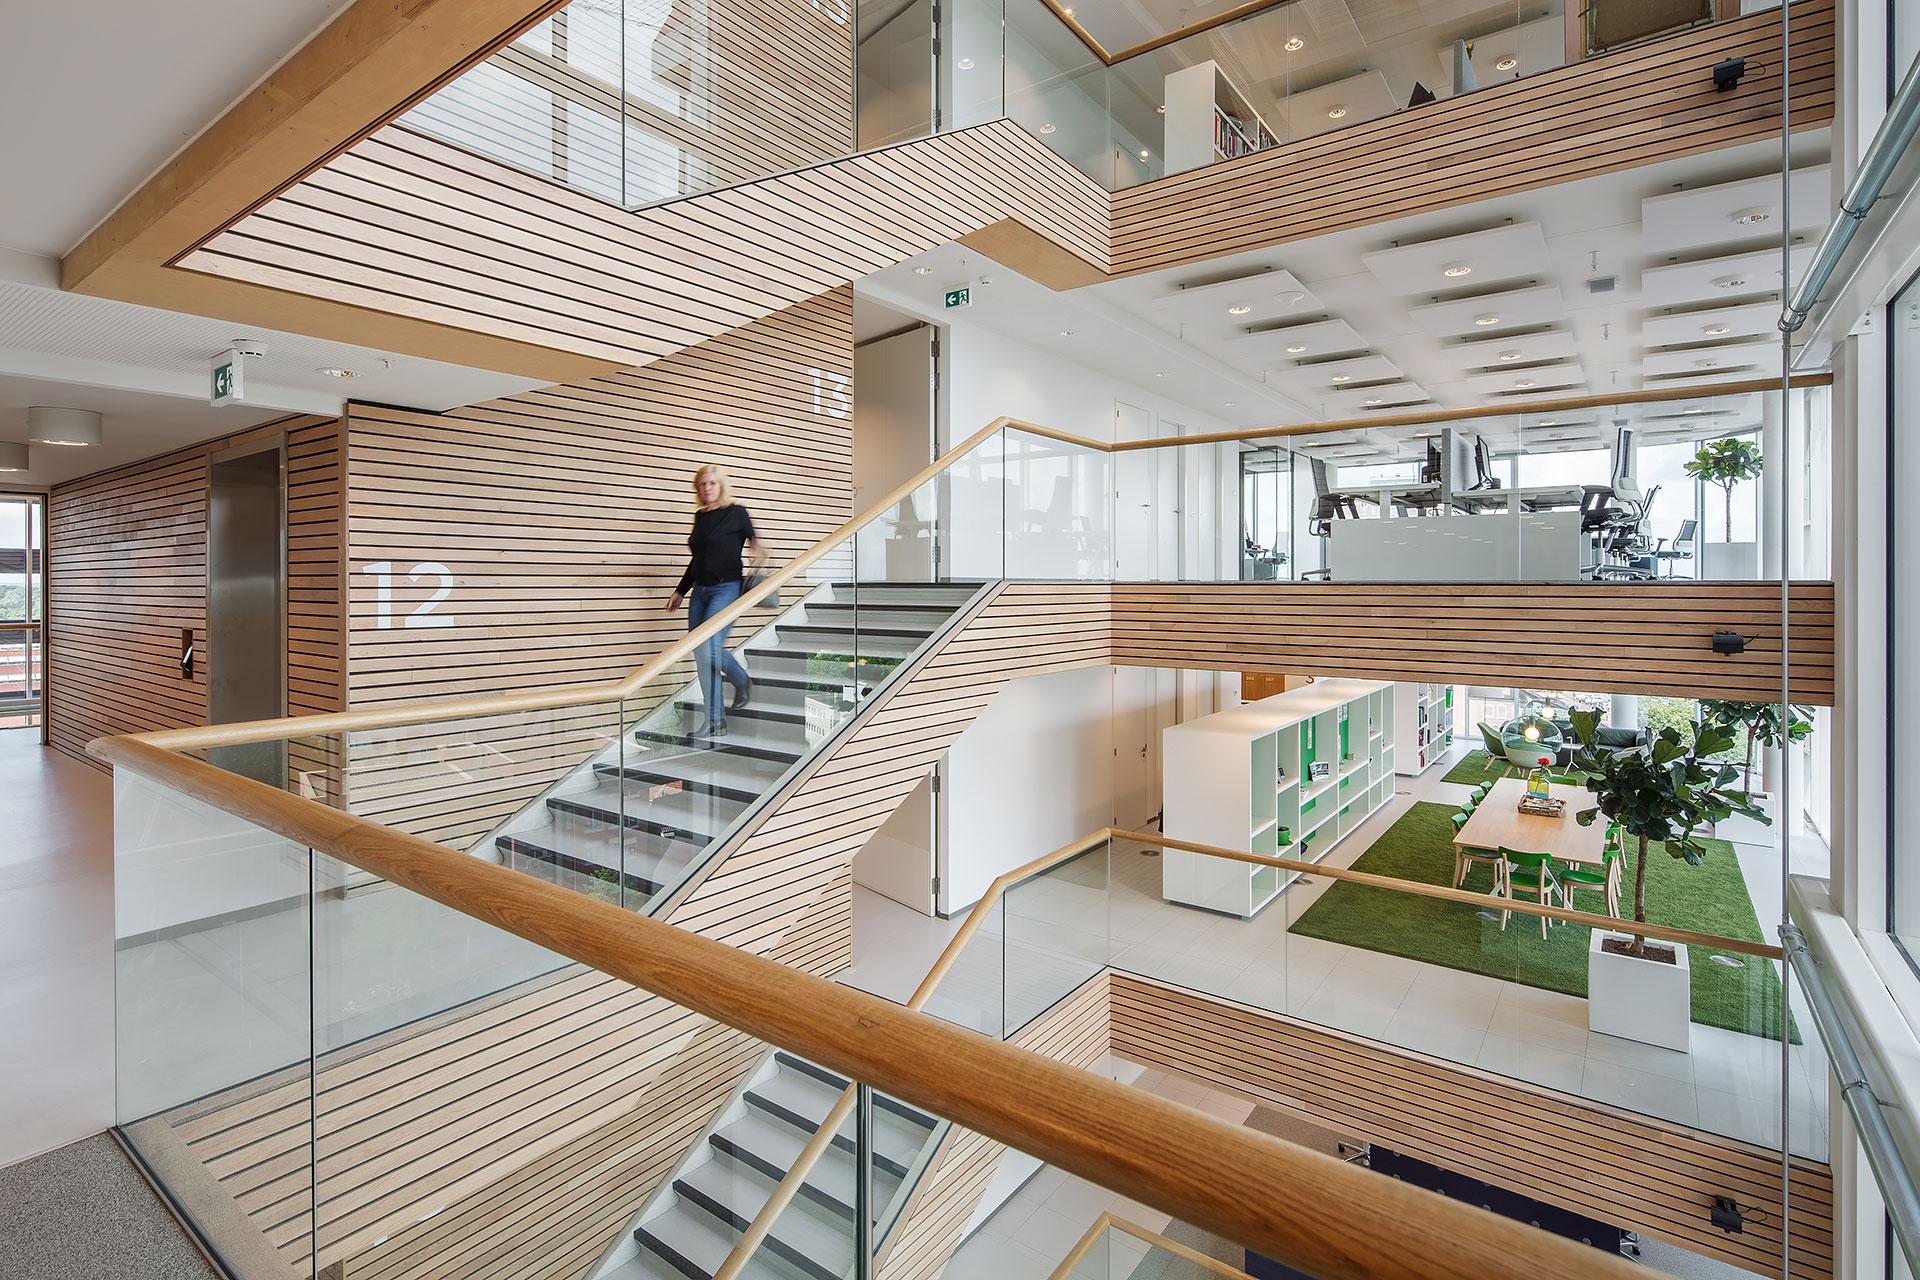 SP2015-Stadhuis-Almelo-architectuurfoto-15